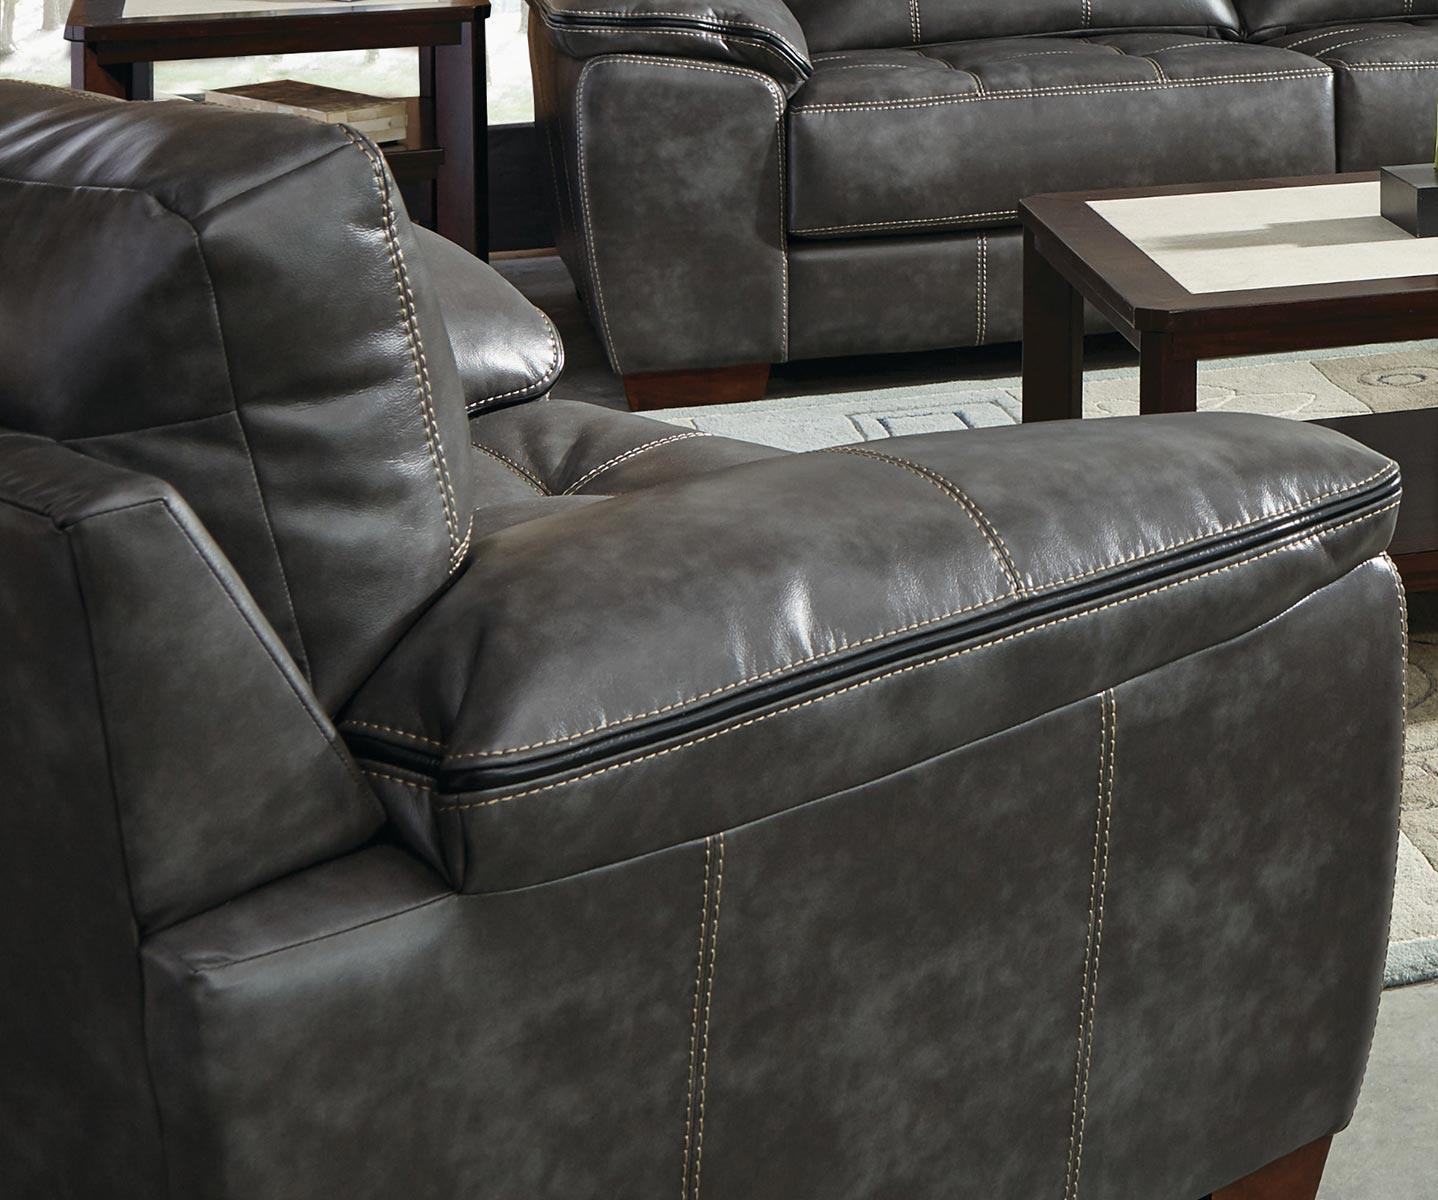 Jackson Hudson Chair and Half - Steel